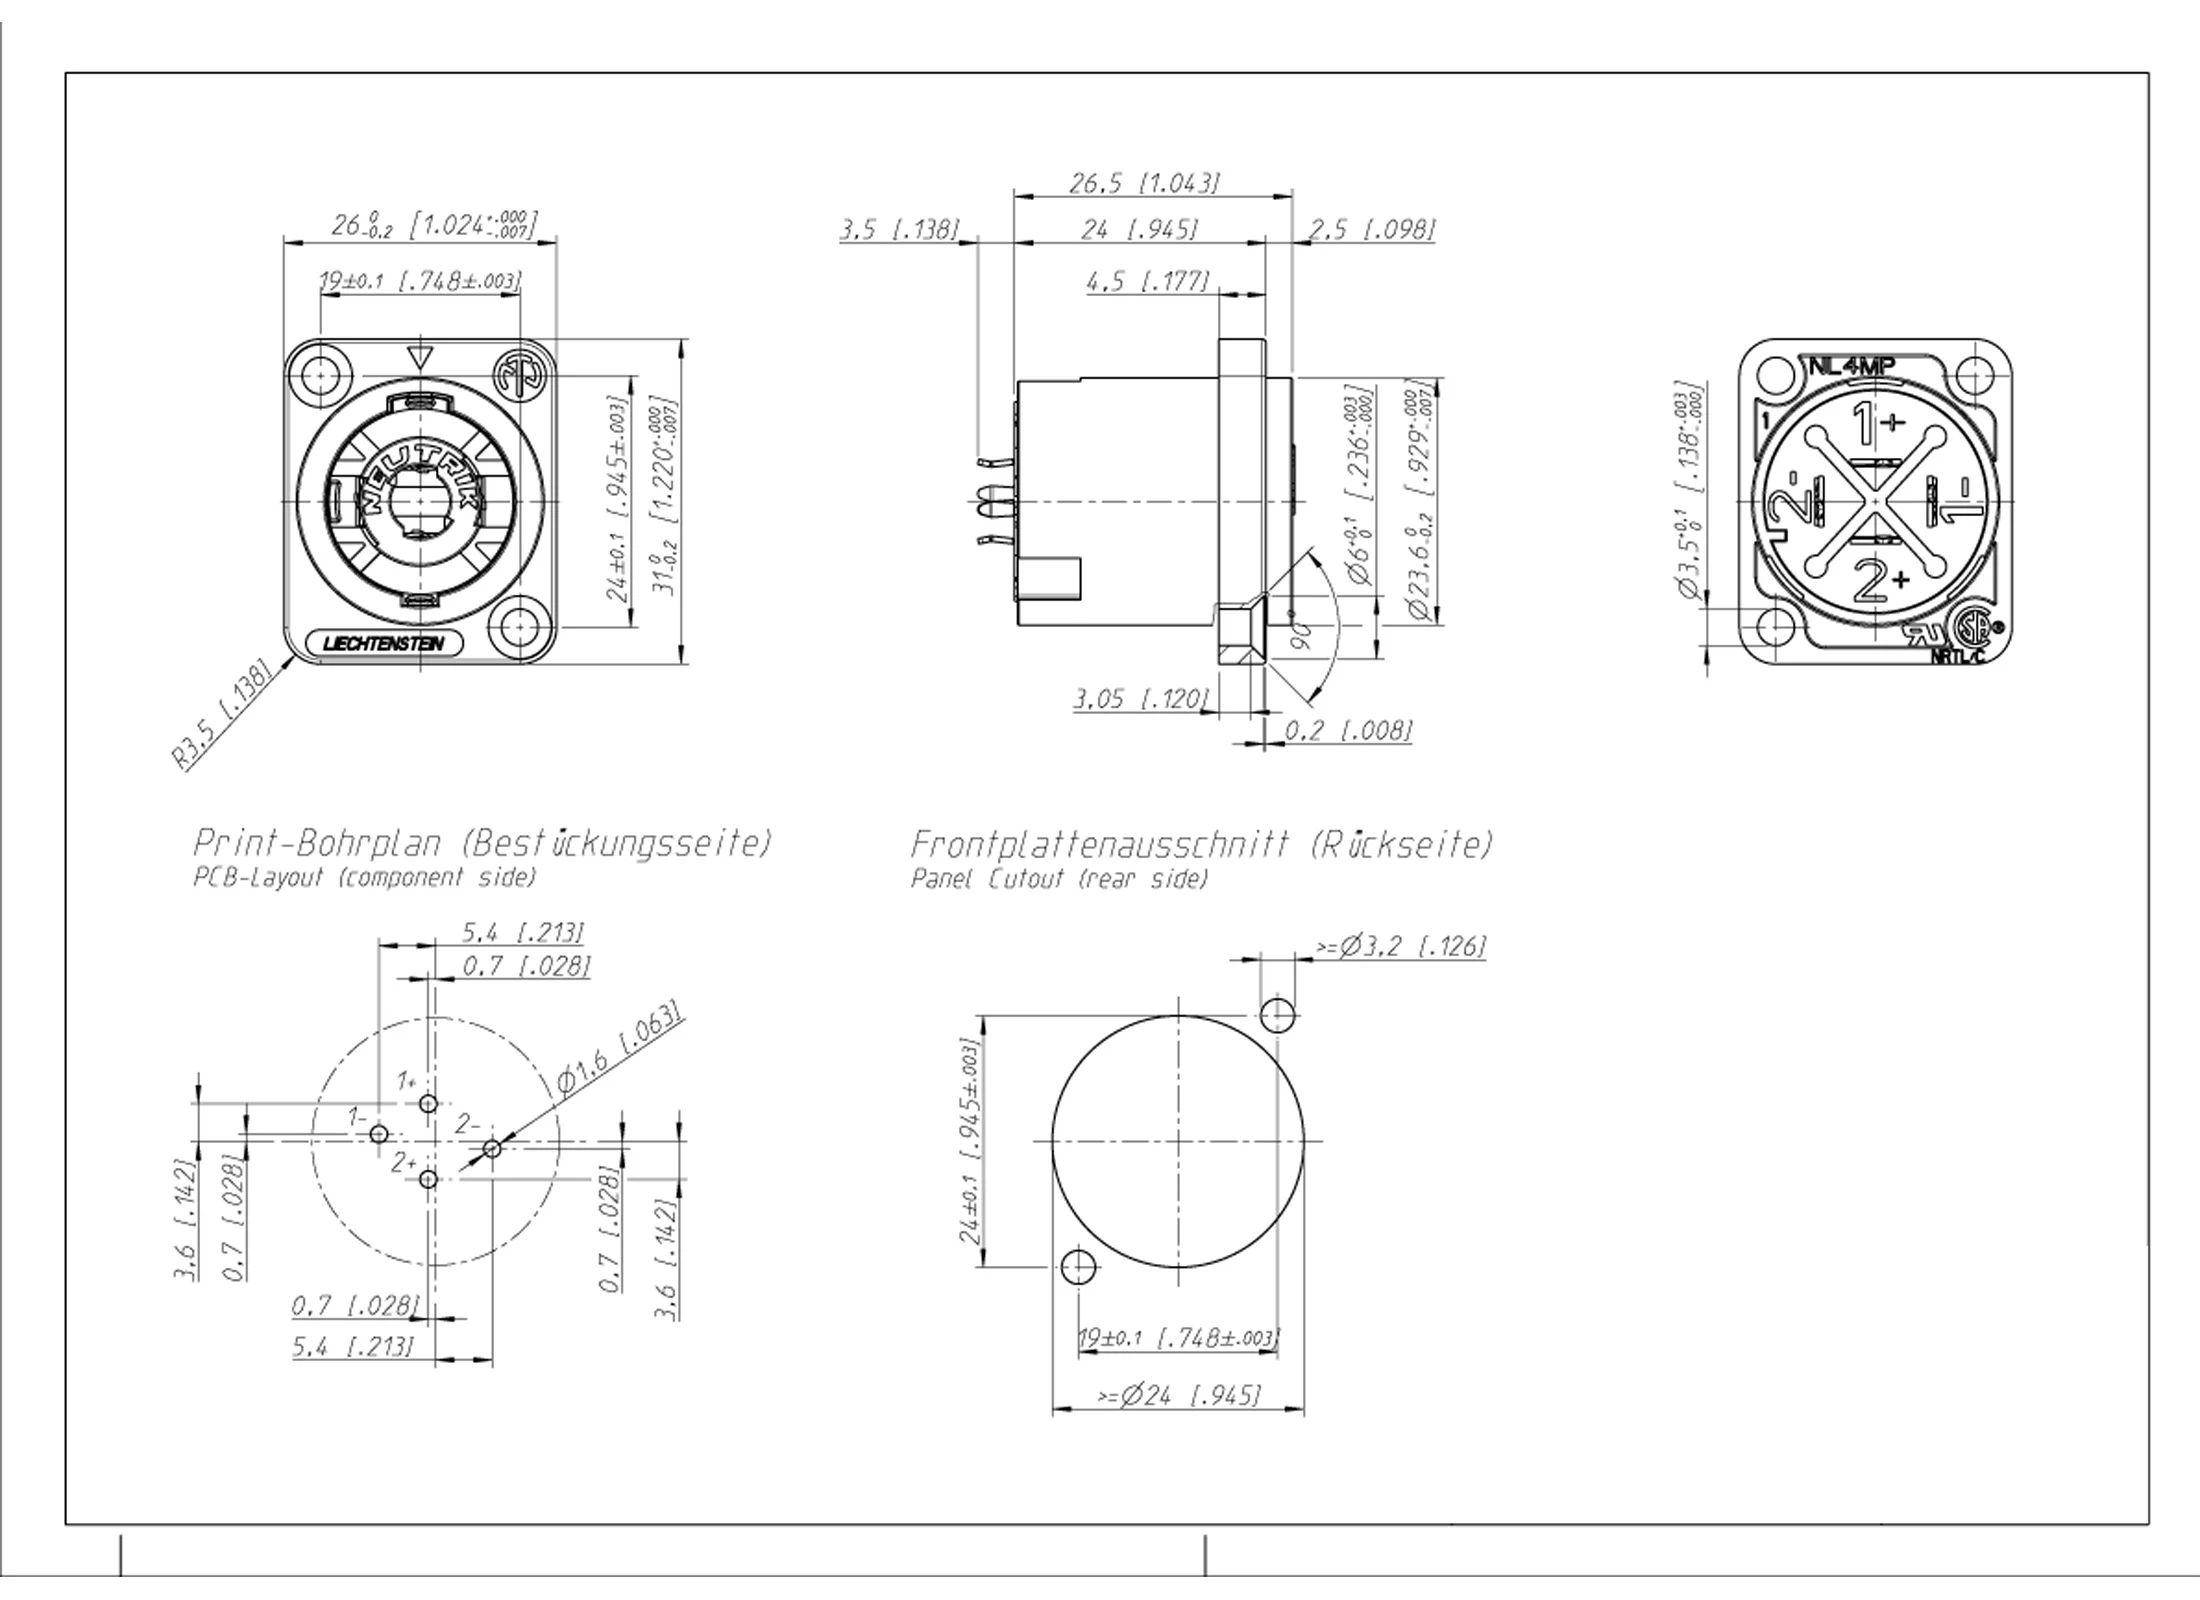 speakon jack wiring diagram